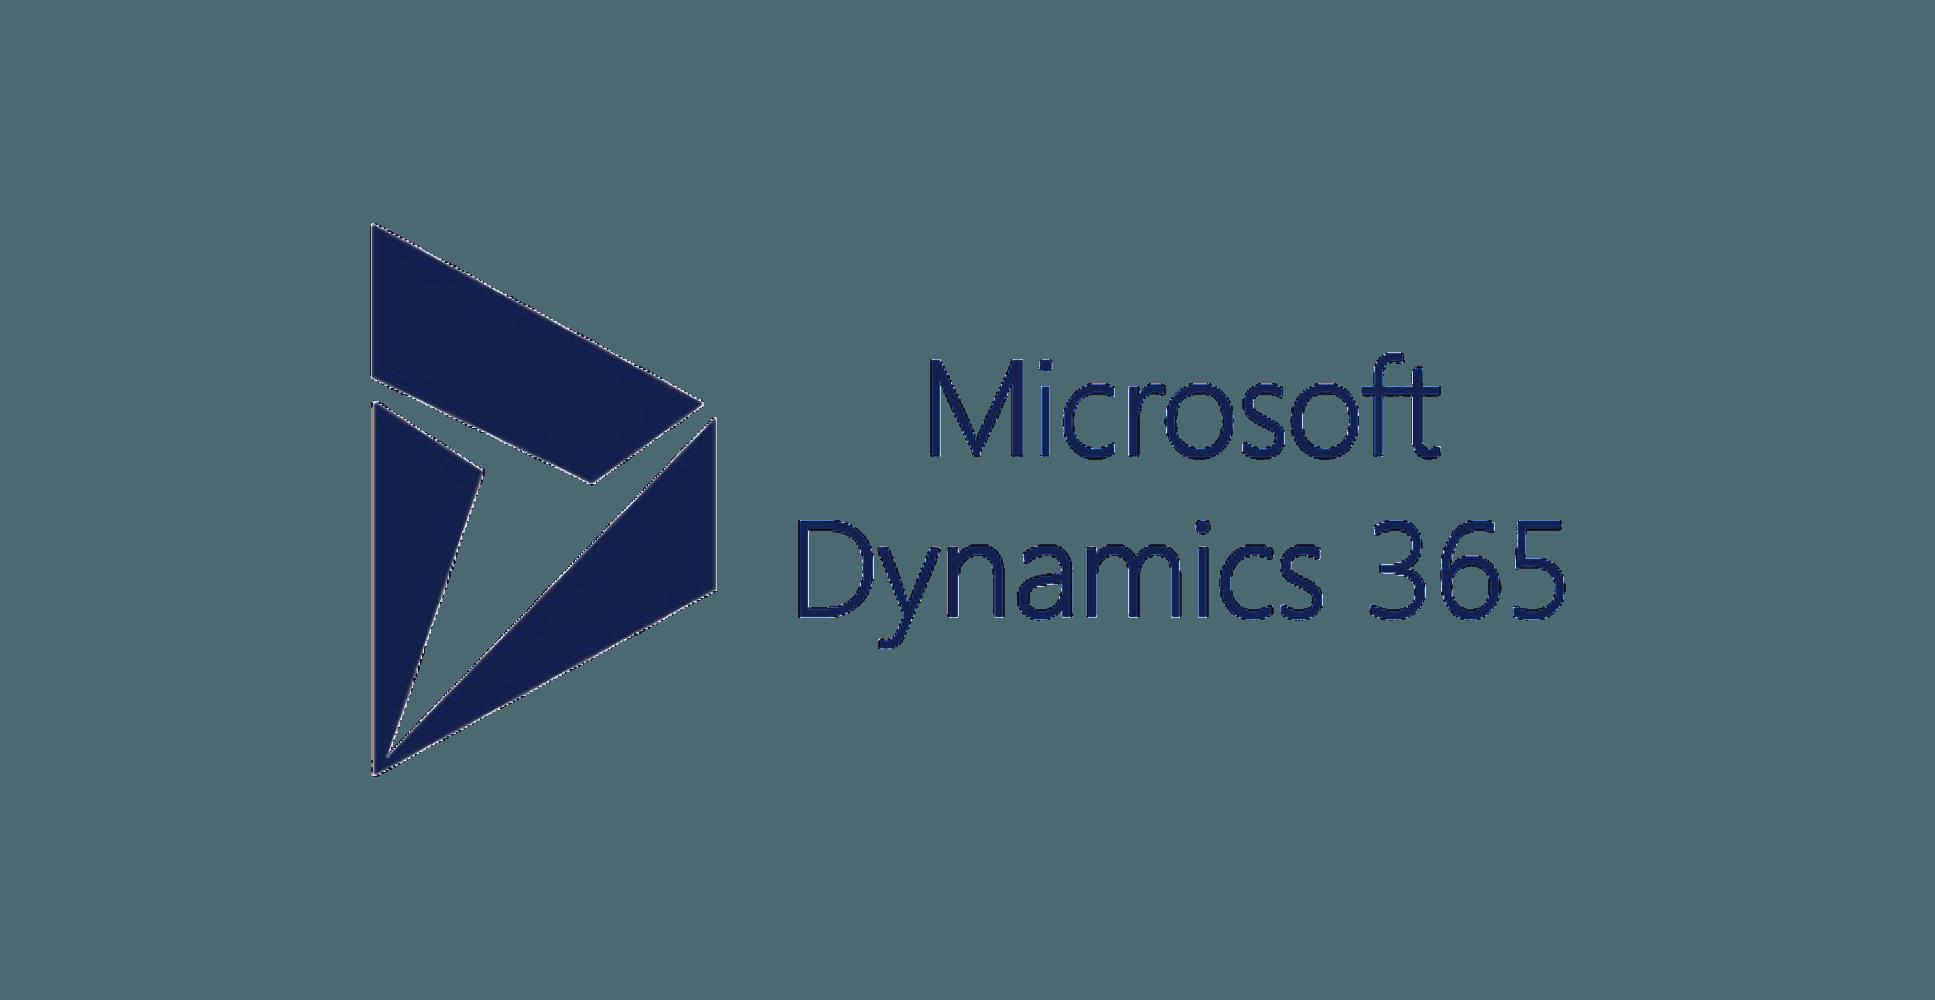 kisspng-logo-dynamics-365-microsoft-dynamics-crm-microsoft-dynamics-365-archive-isolutions-ag-5b8f2027e398e6.6173522115361065359323